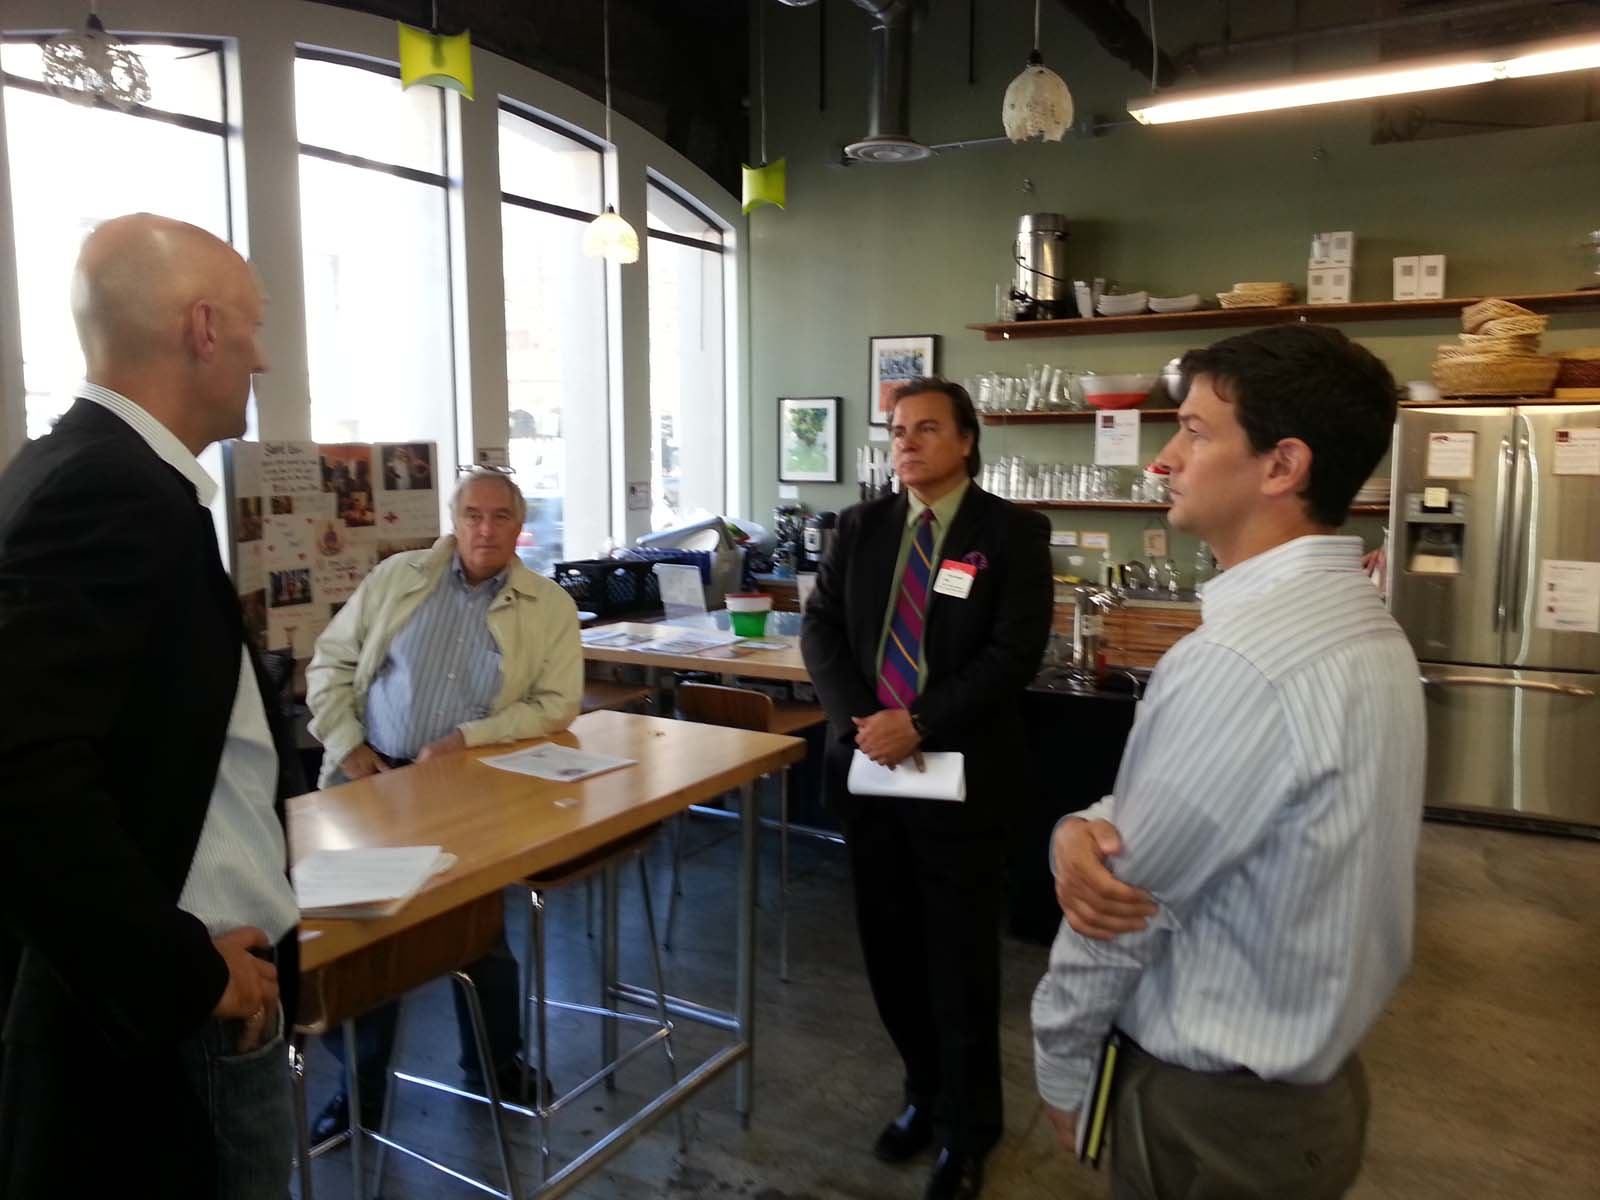 HUB Kitchen - Greg Delaune, David Holley, Chris Zapata, Jeff Kay